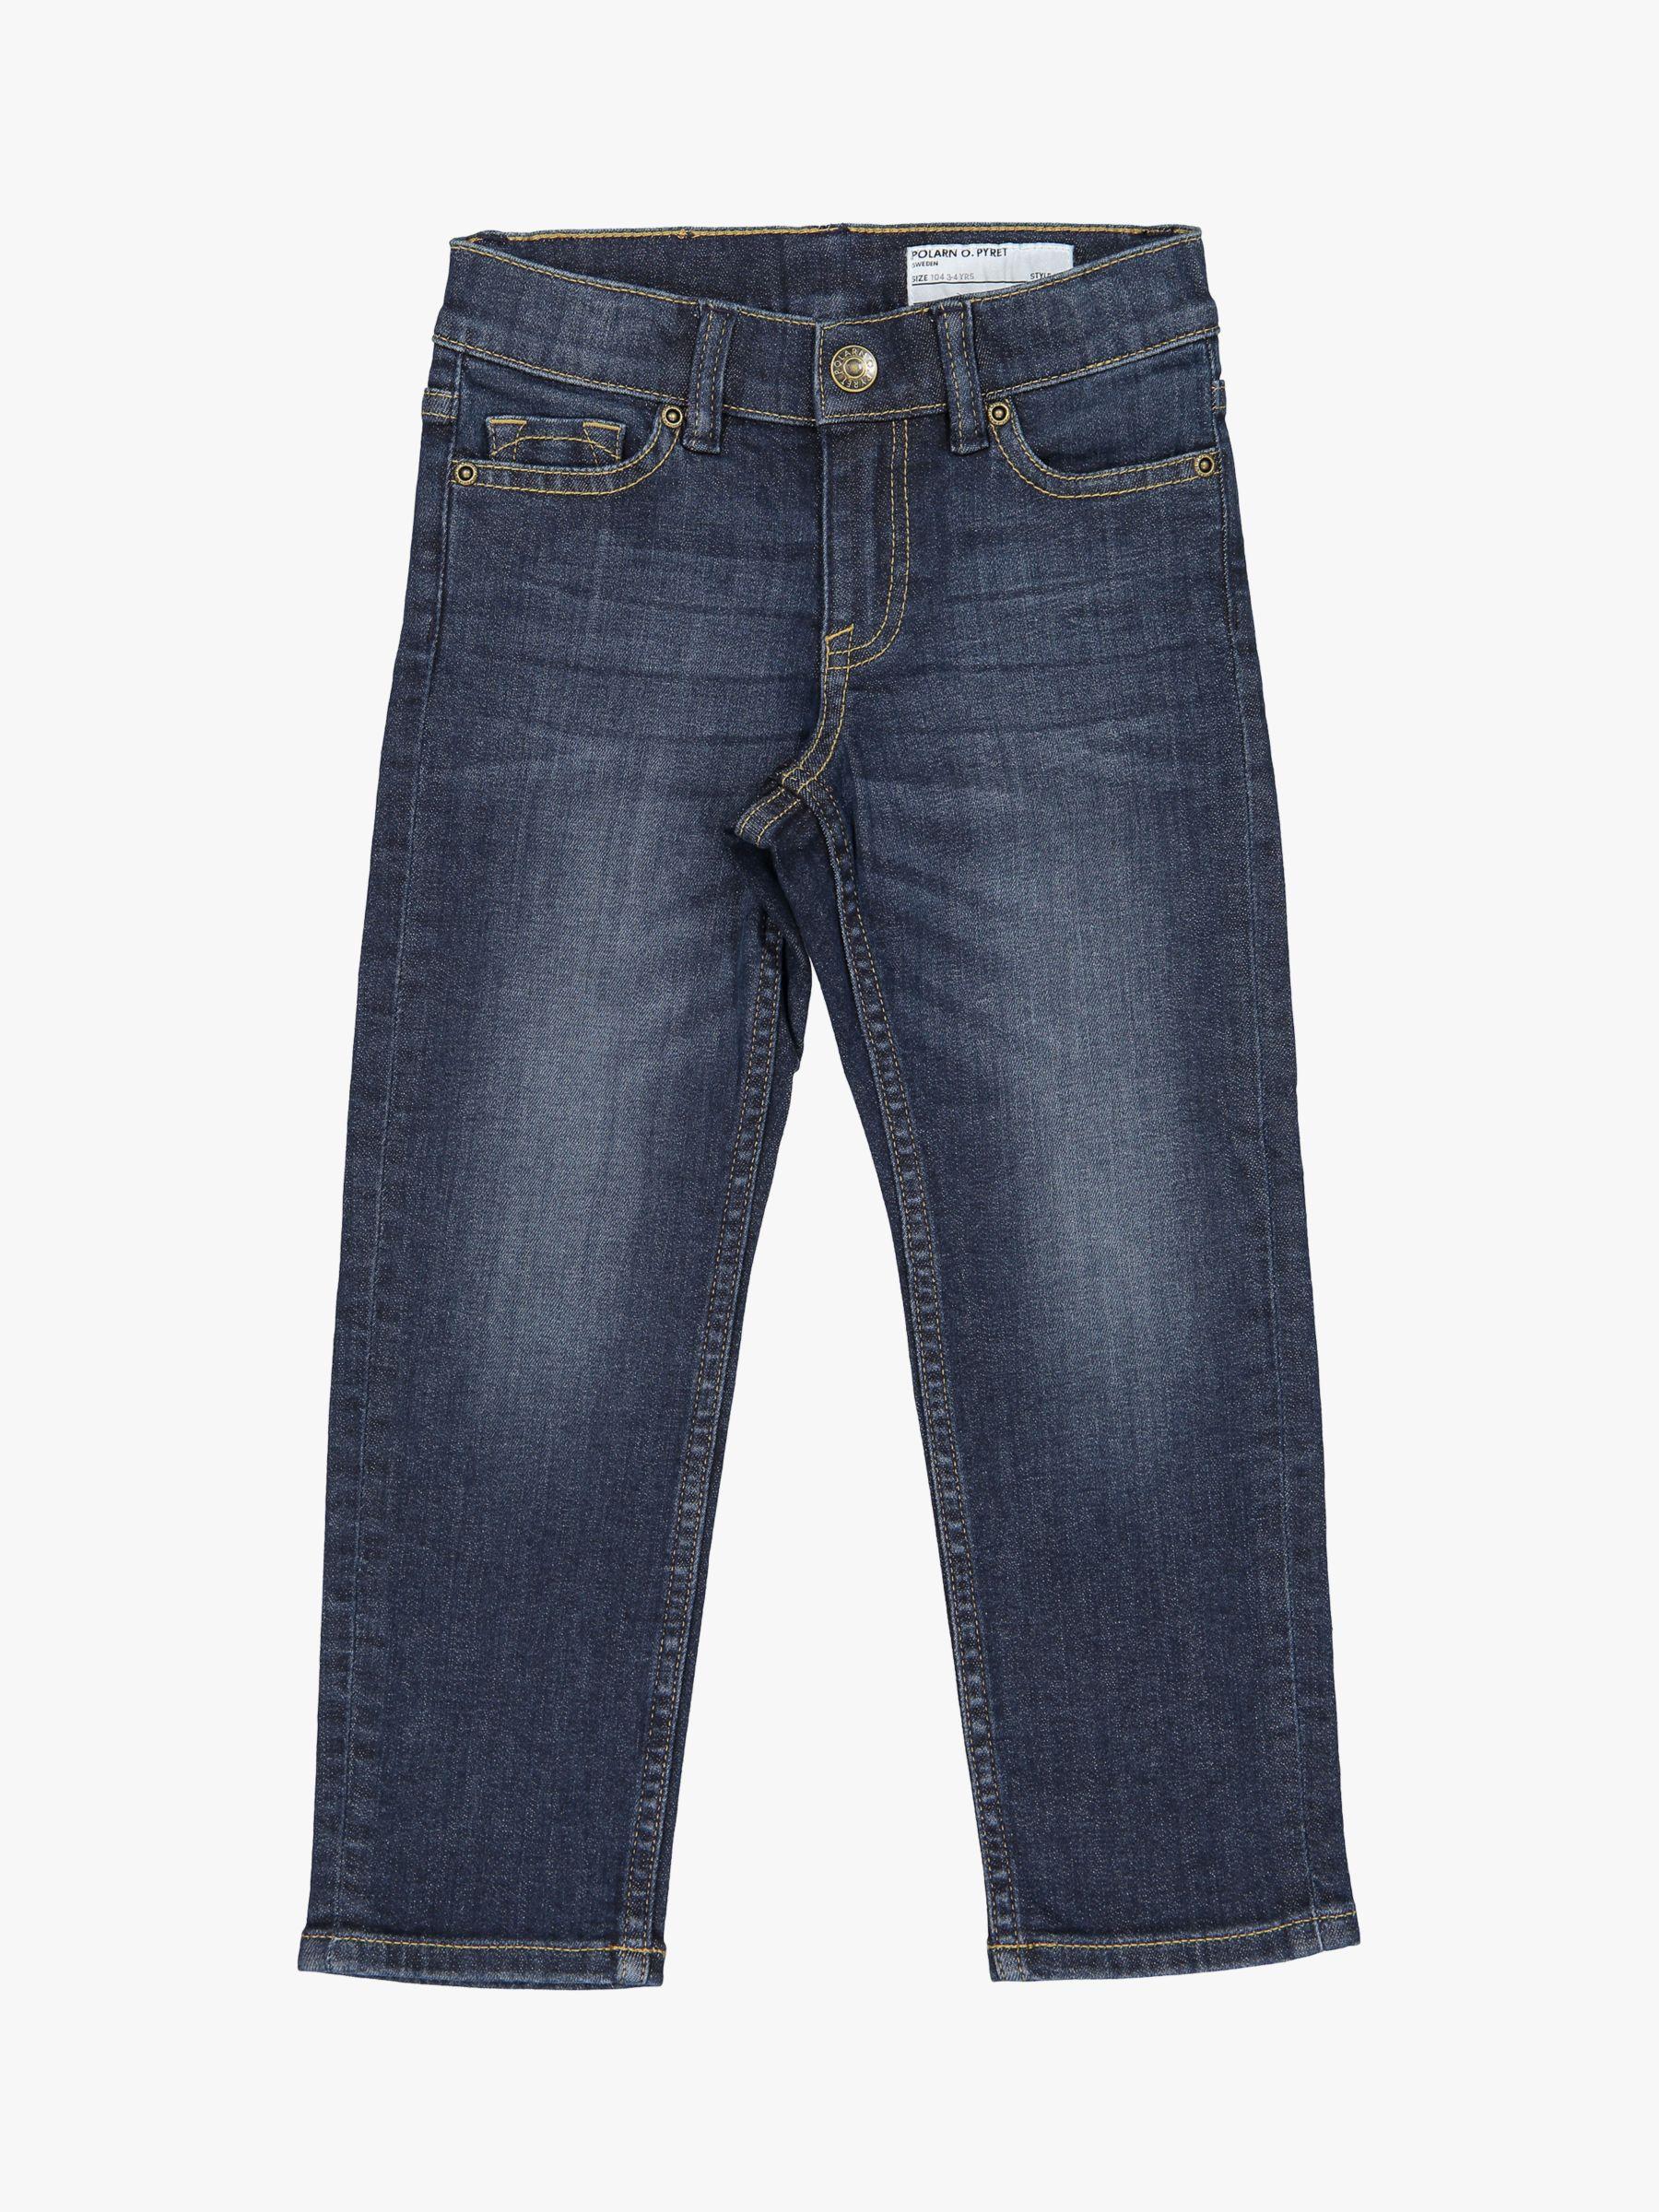 Polarn O. Pyret Polarn O. Pyret Children's Regular Fit Denim Jeans, Blue